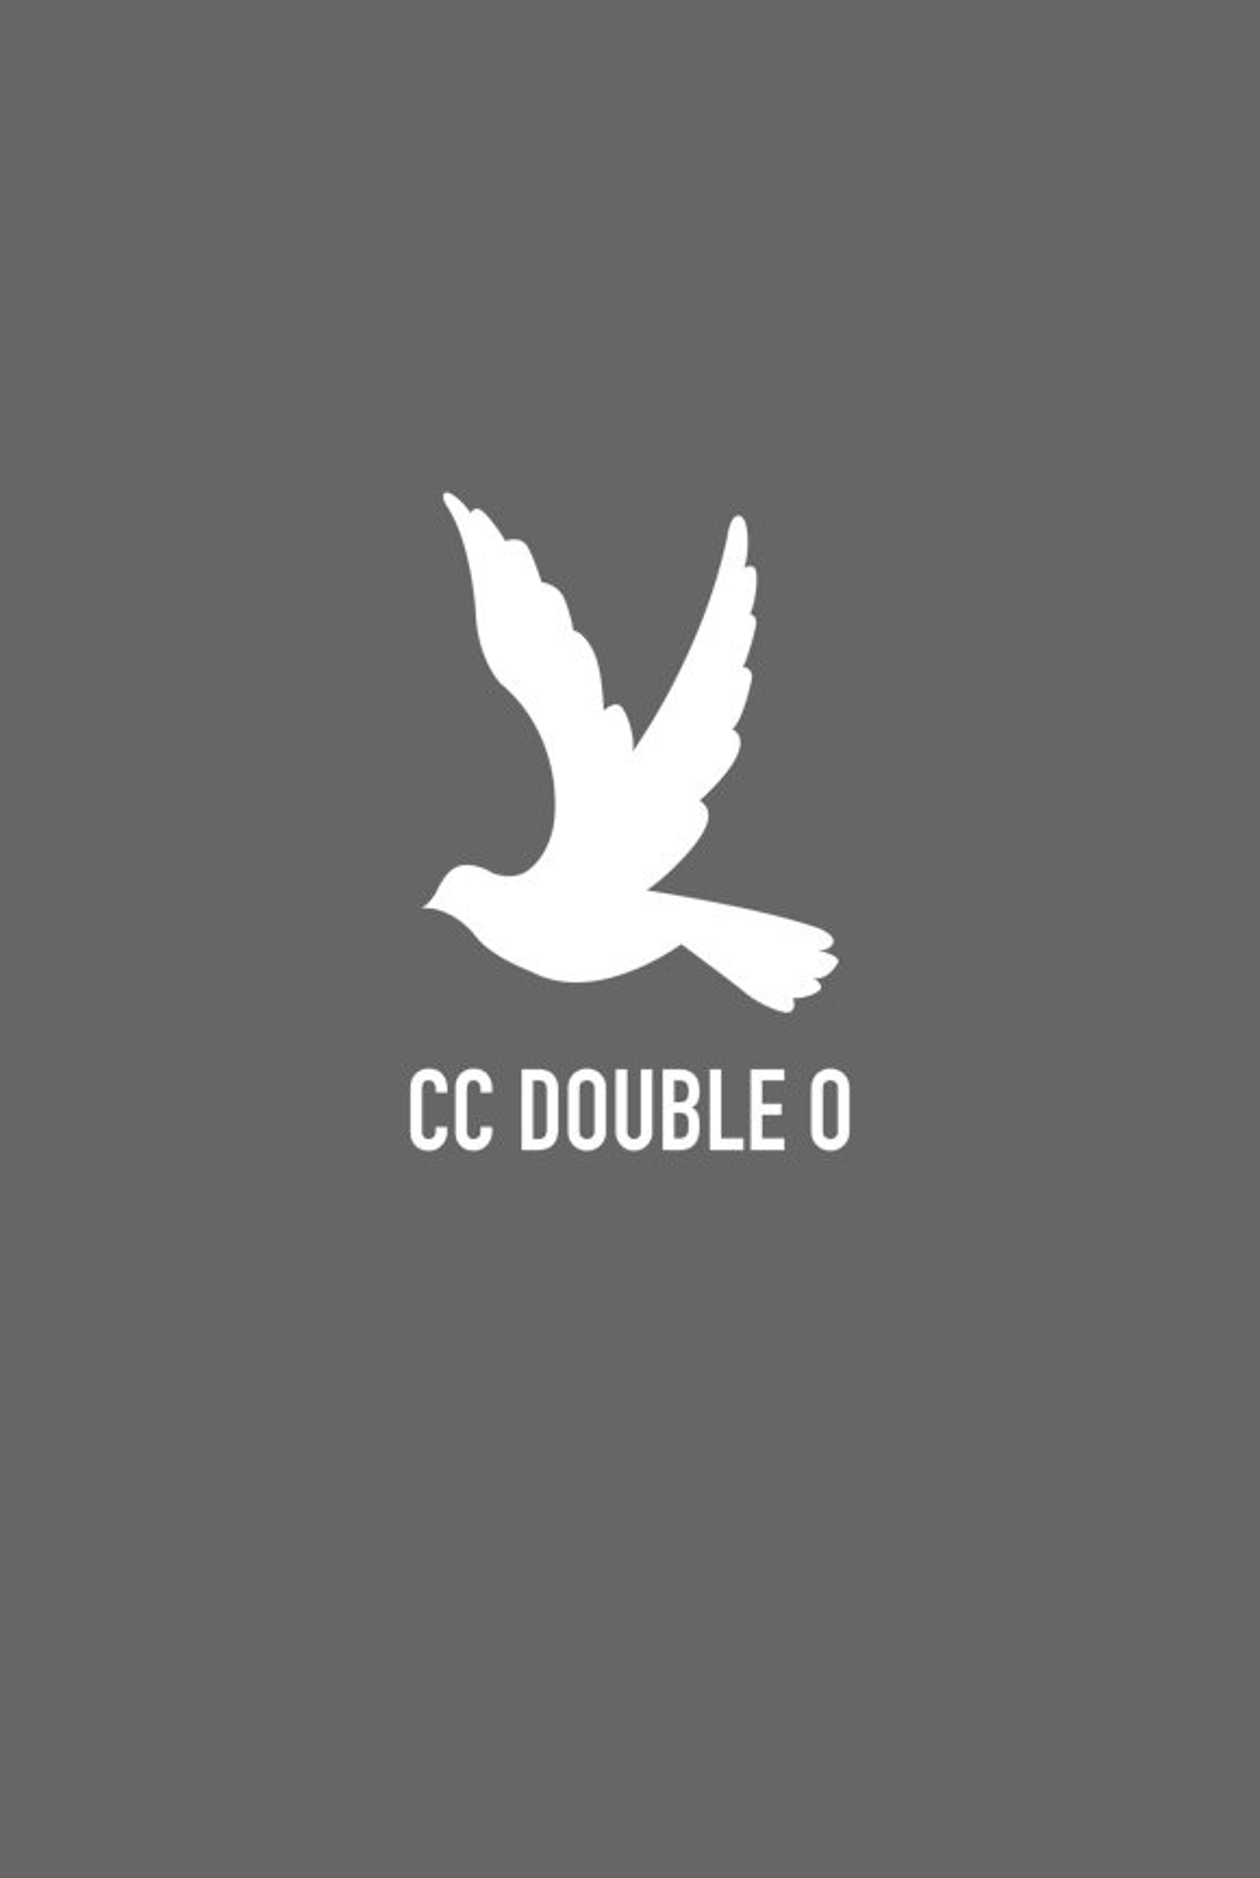 CC DOUBLE O Badge iPhone 7 & 8 Plus Case